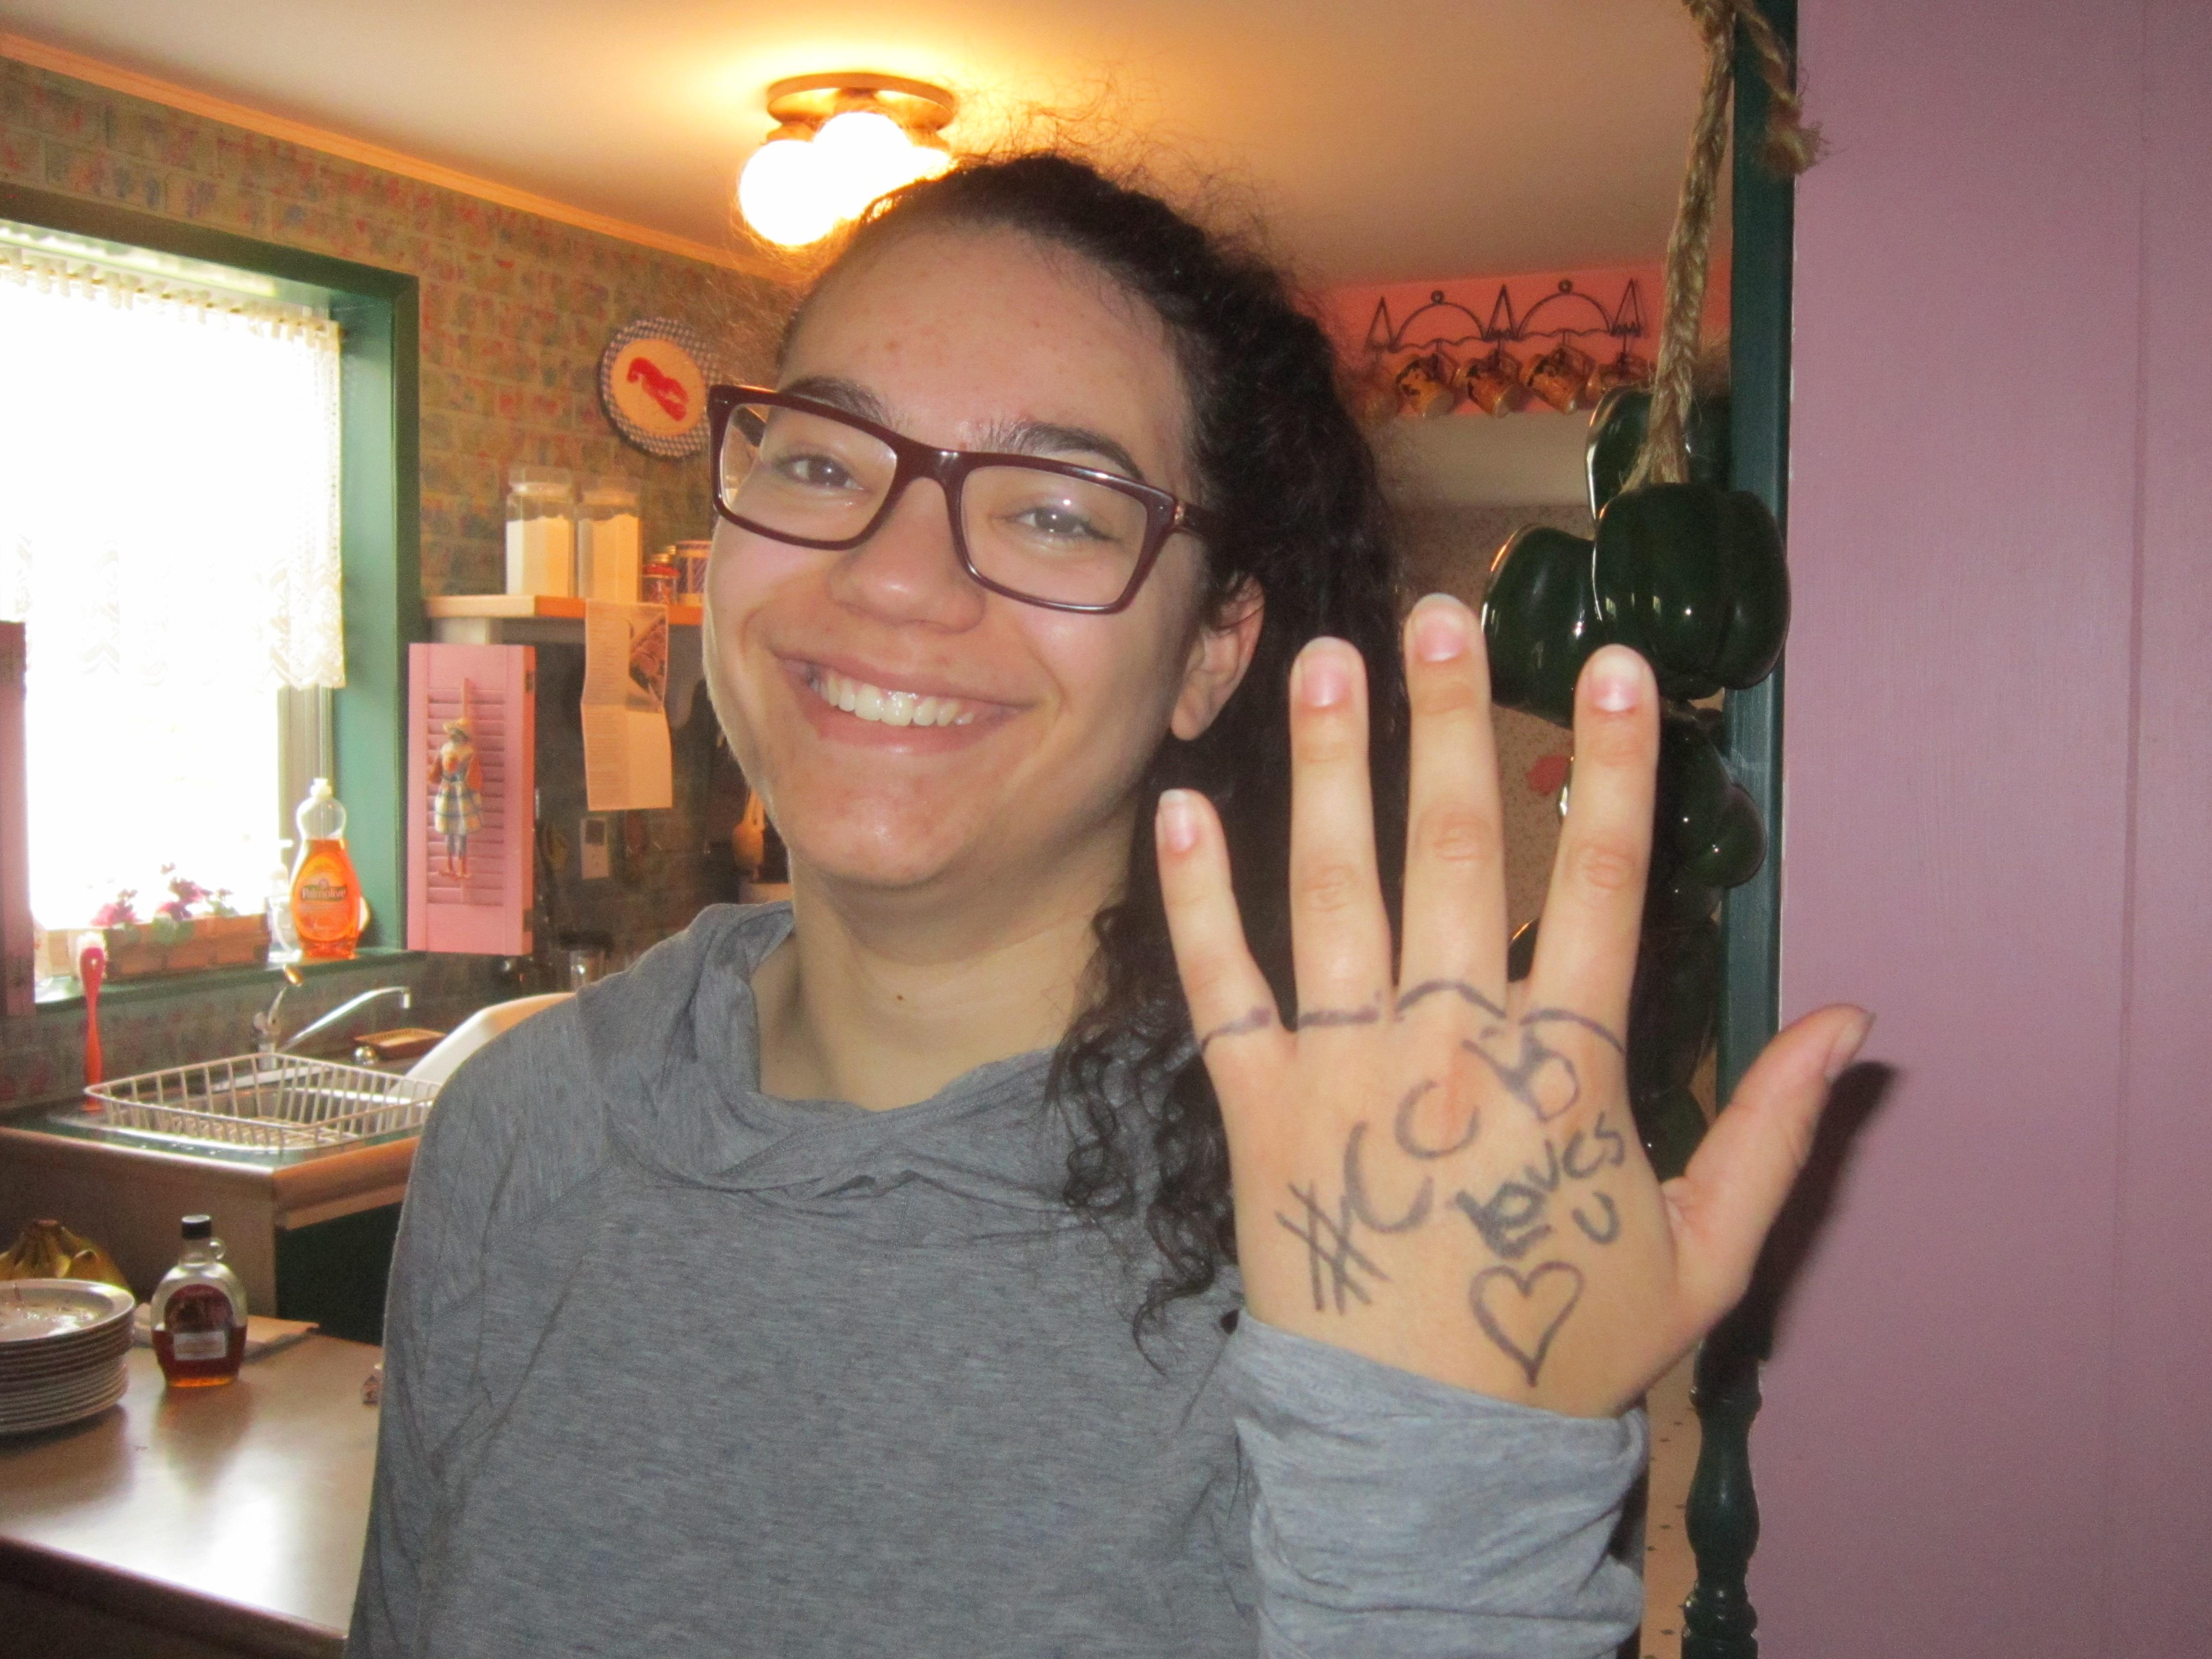 Renee's Tattoo.JPG